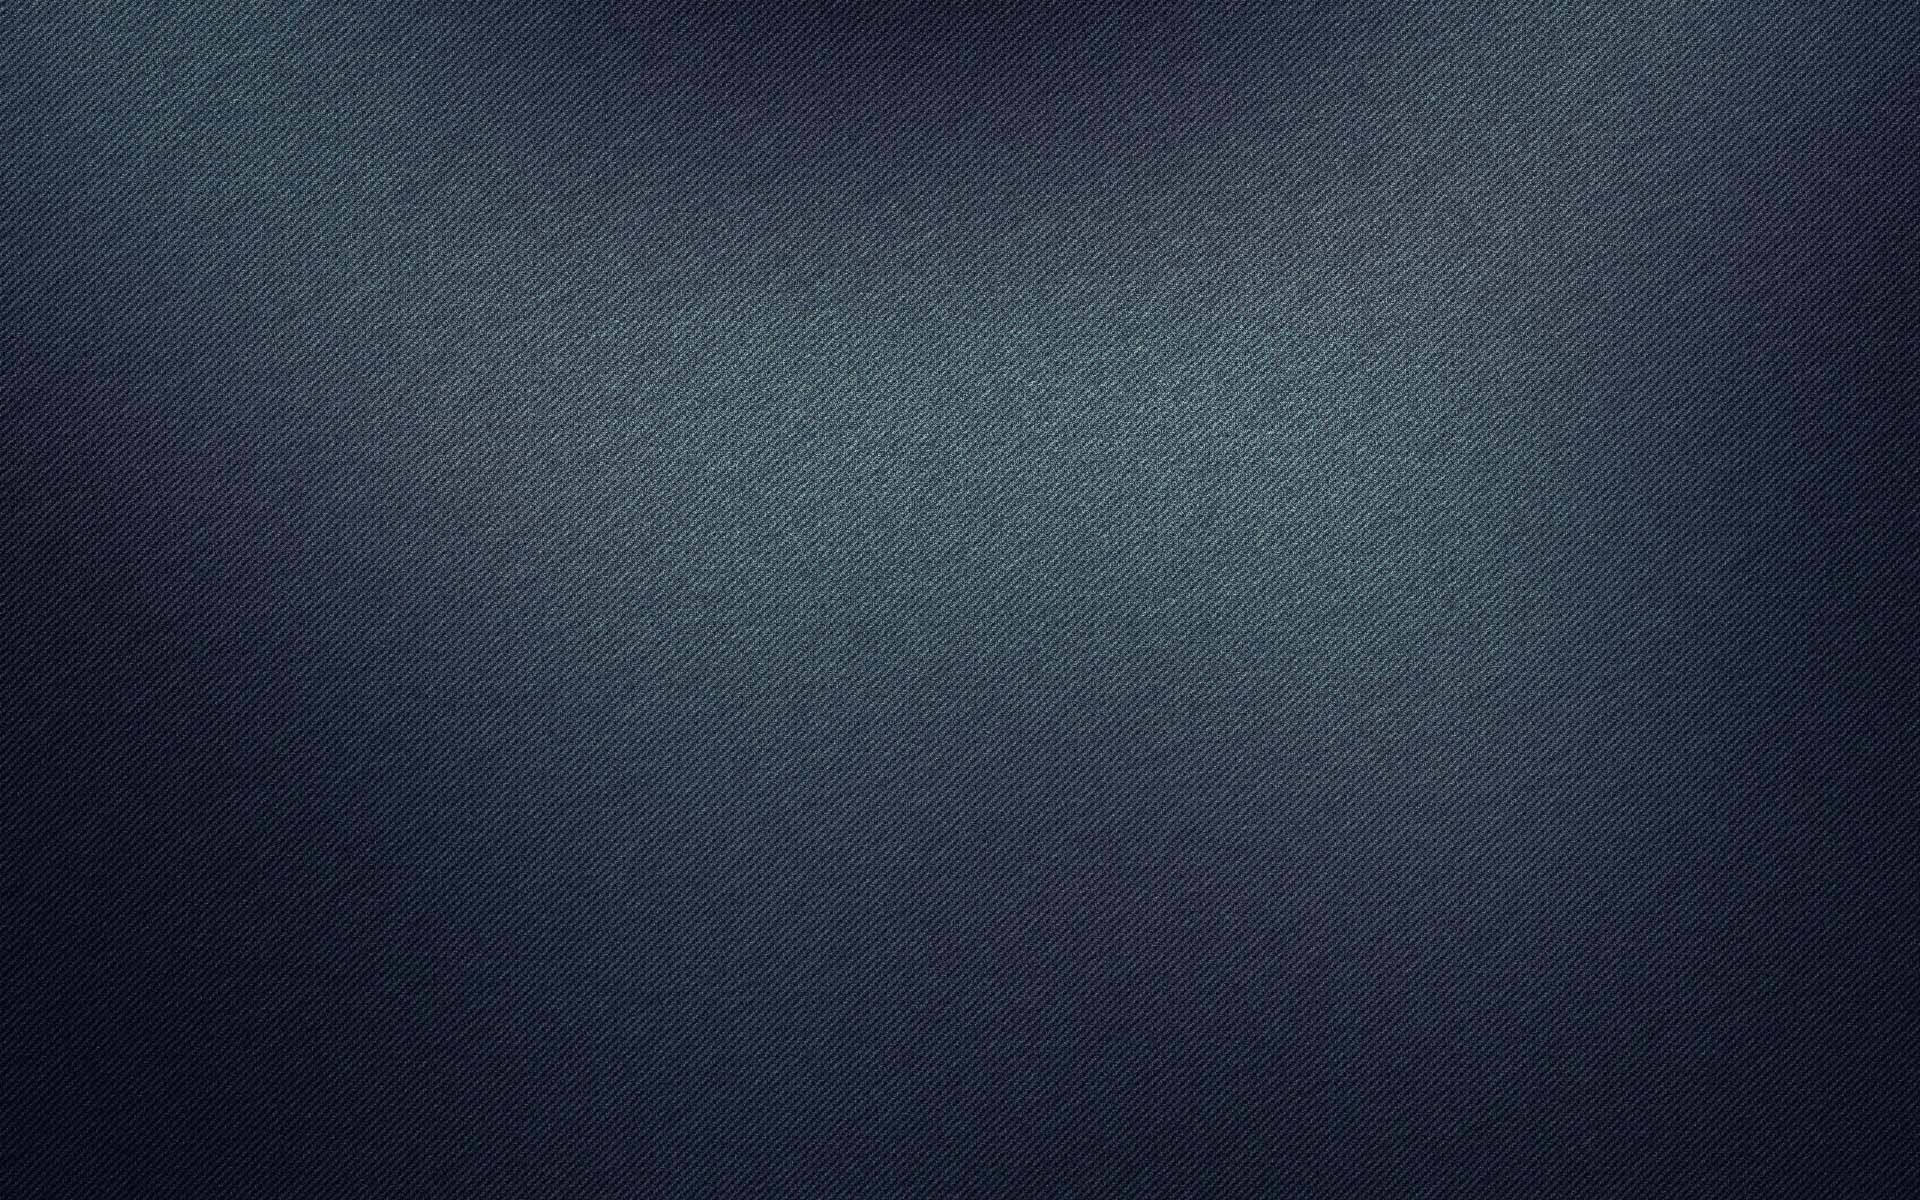 78 Hd Texture Wallpapers On Wallpapersafari